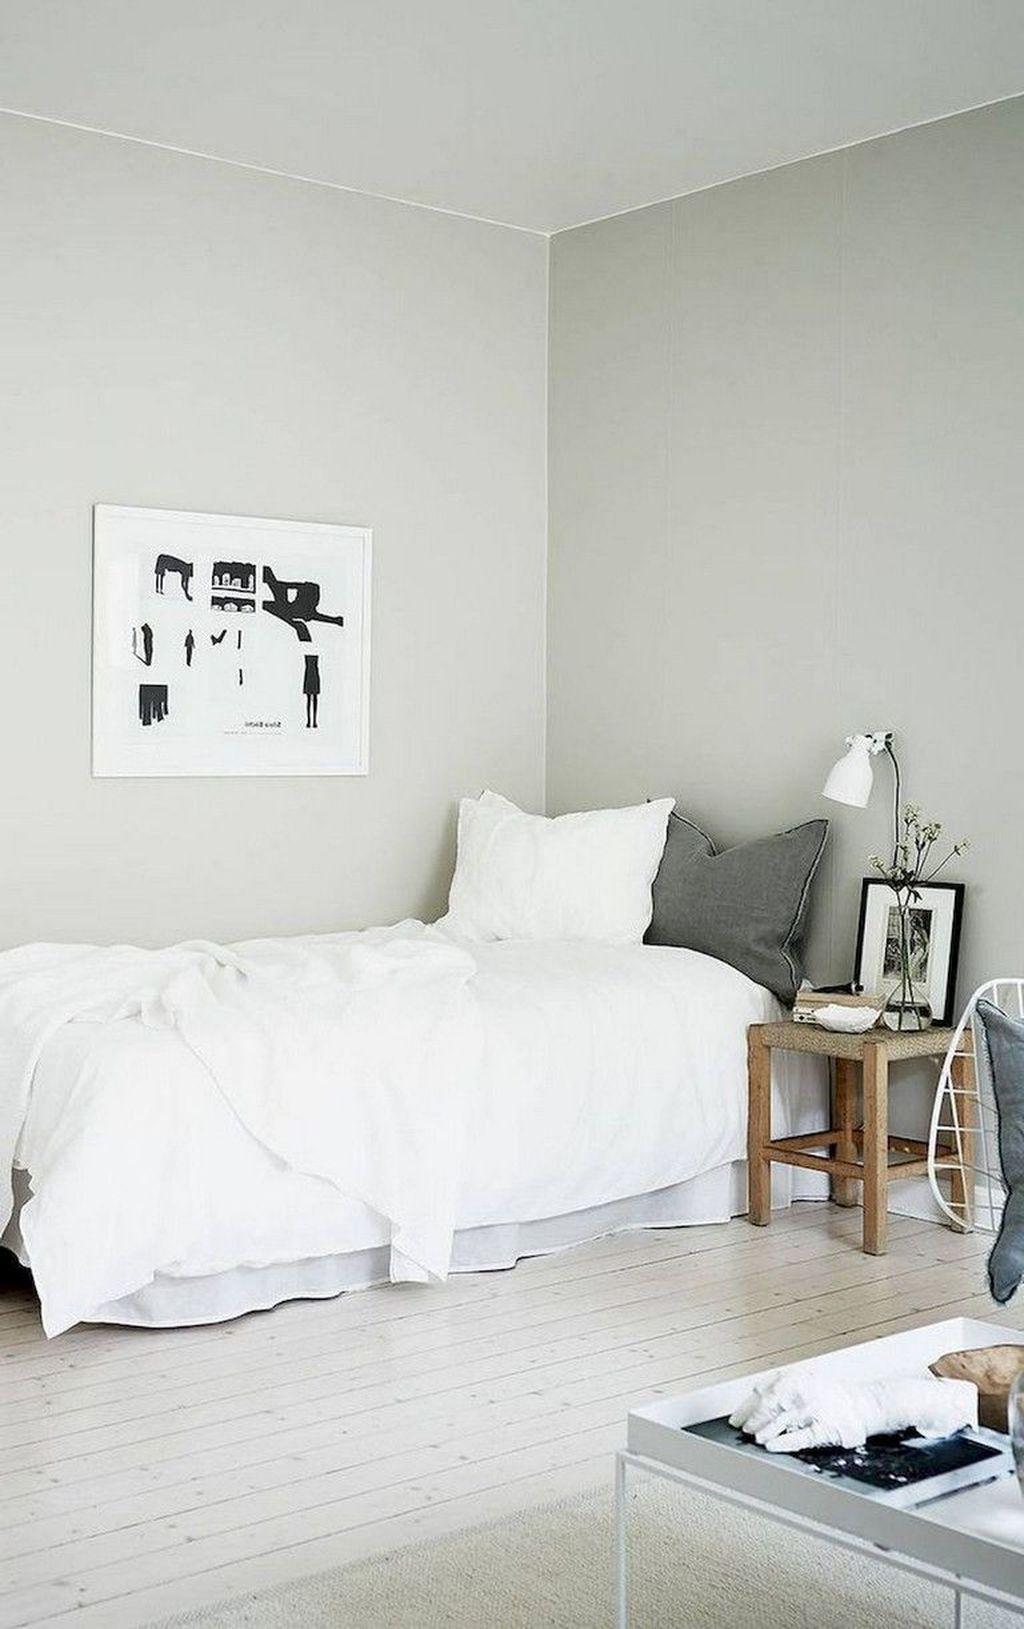 Best Minimalist Bedroom Design Ideas To Try Asap 36